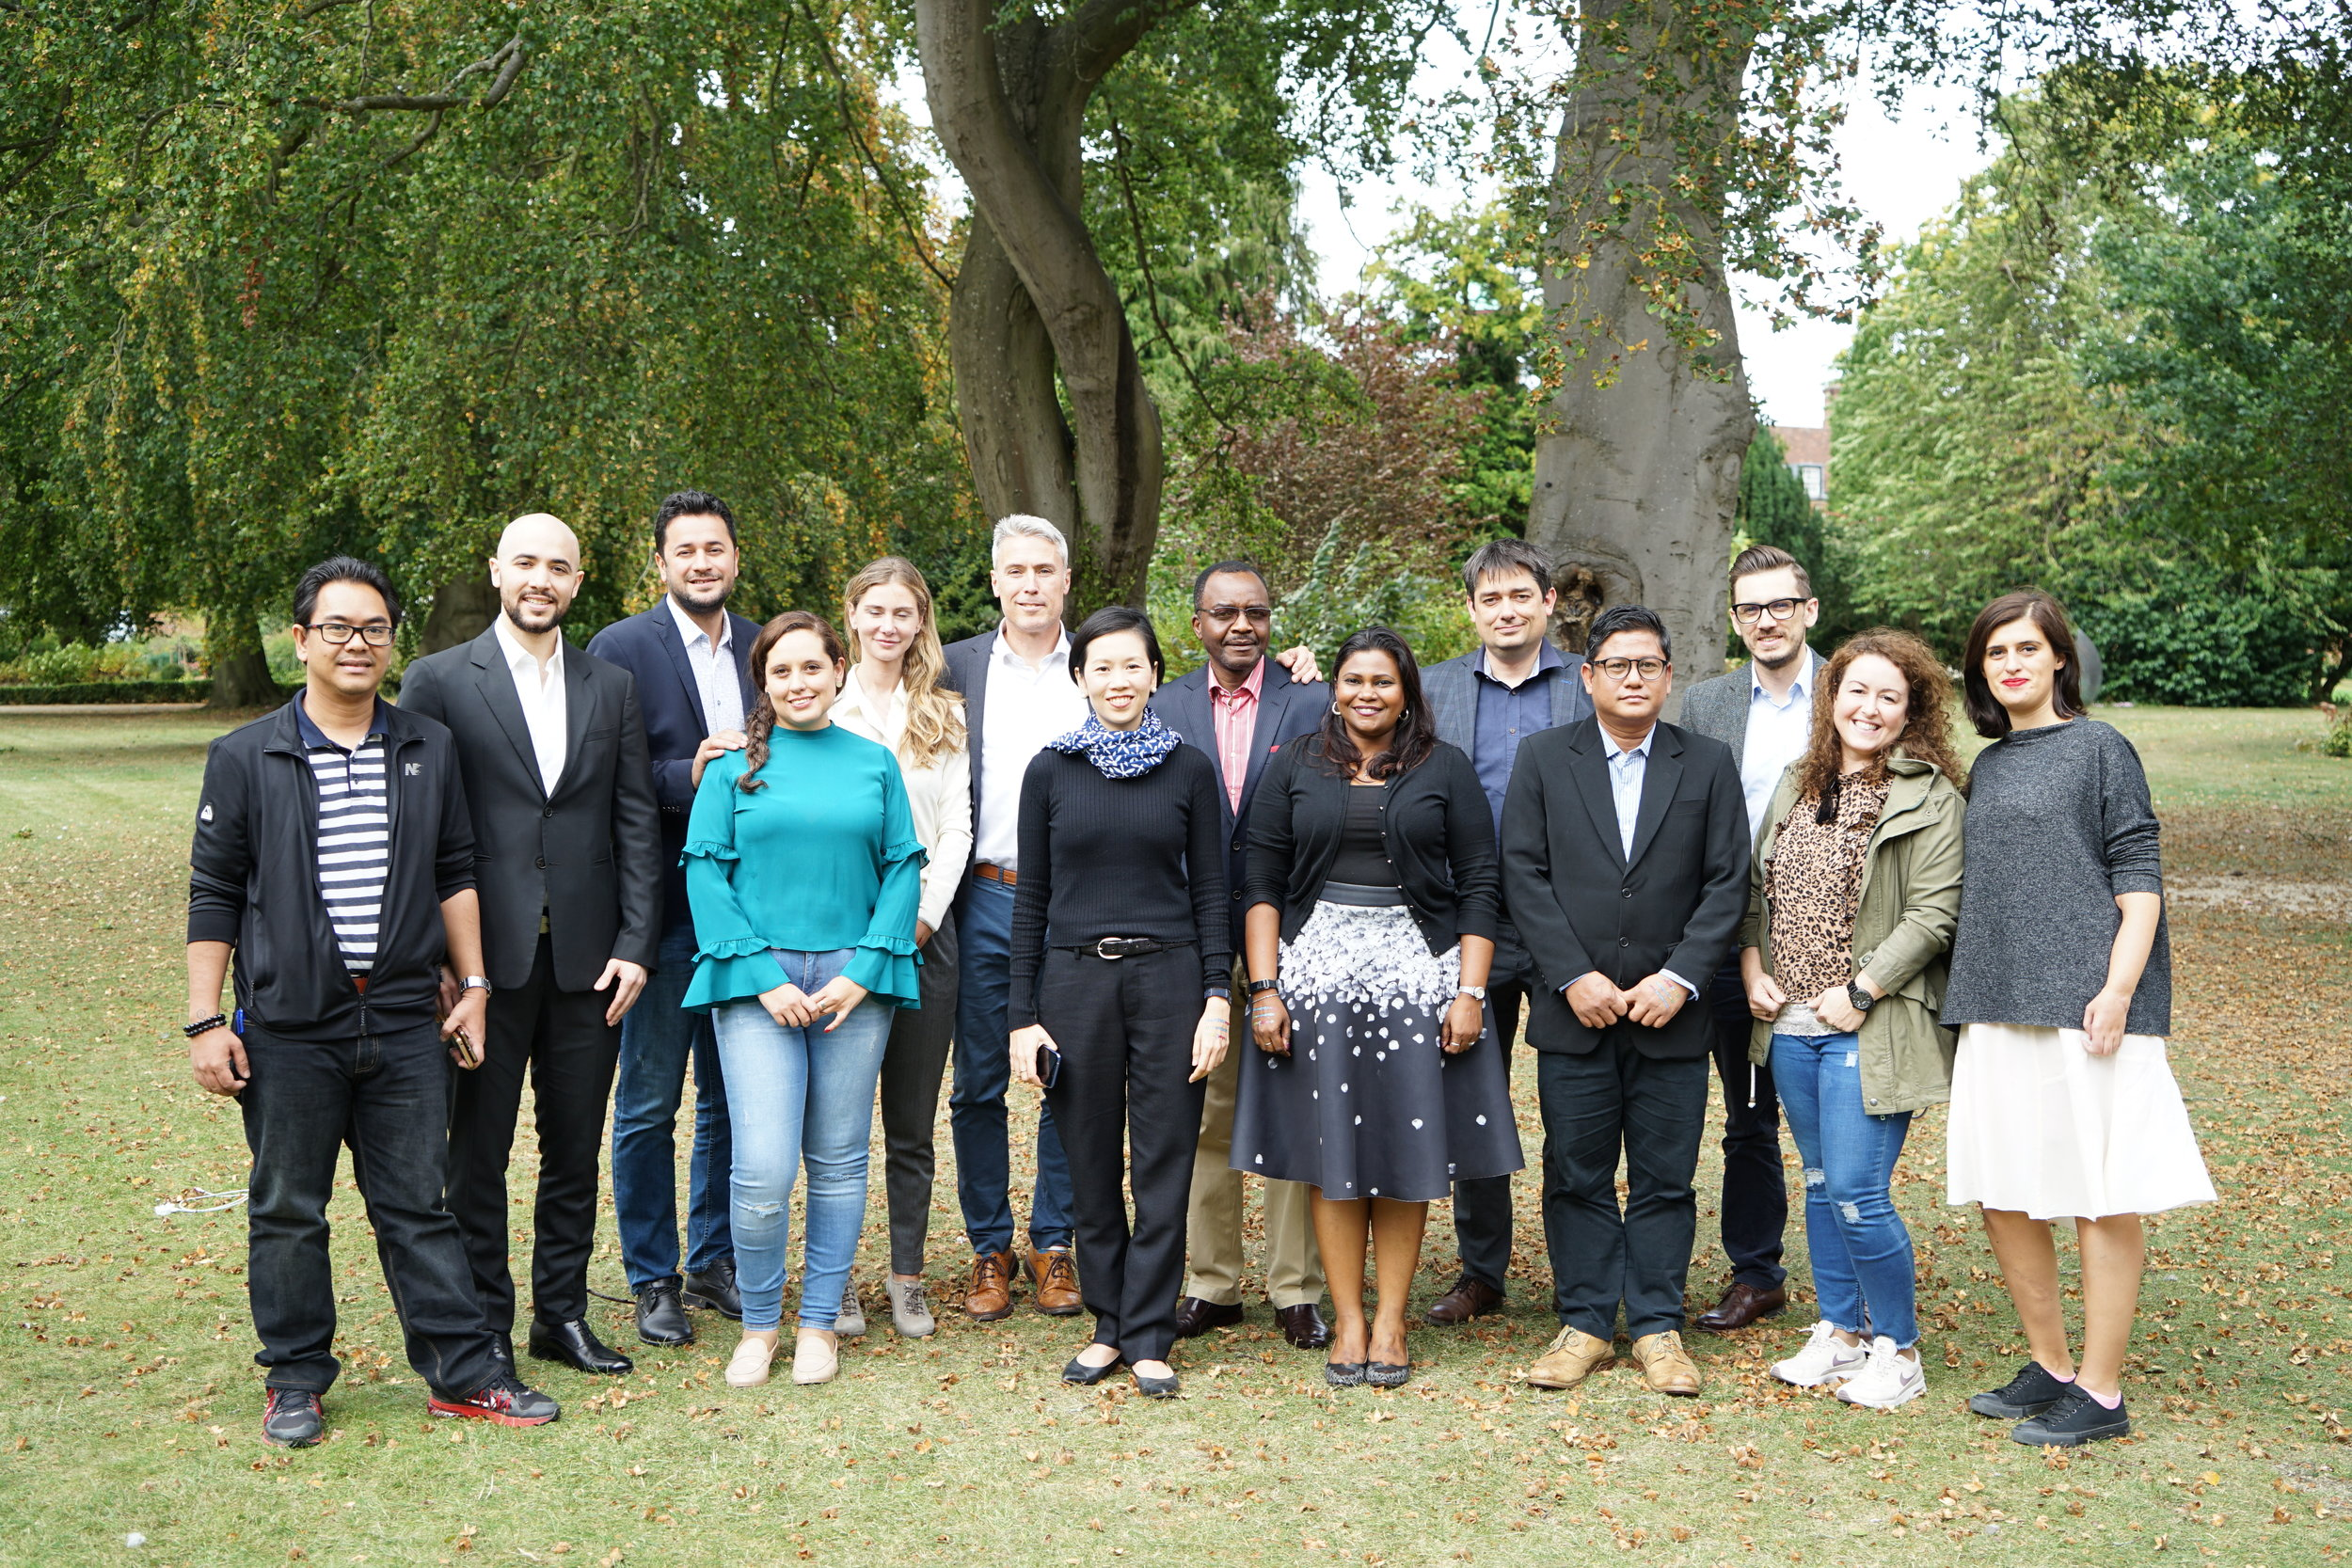 IPPFoRB Academy 2018 in Oxford, UK